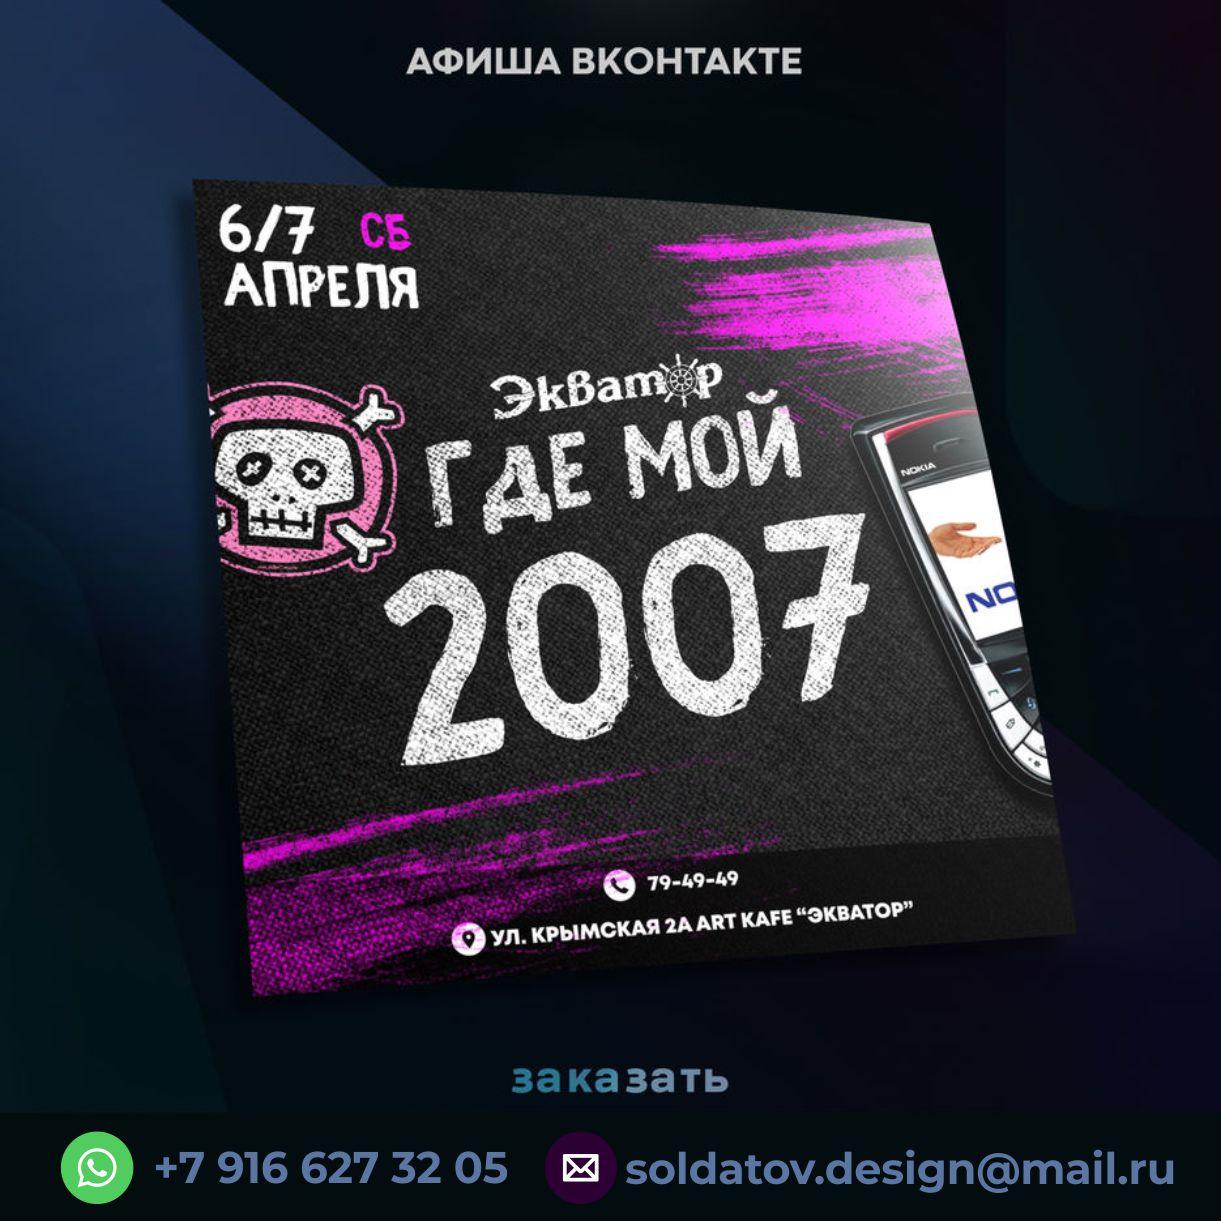 A0ec7a644f